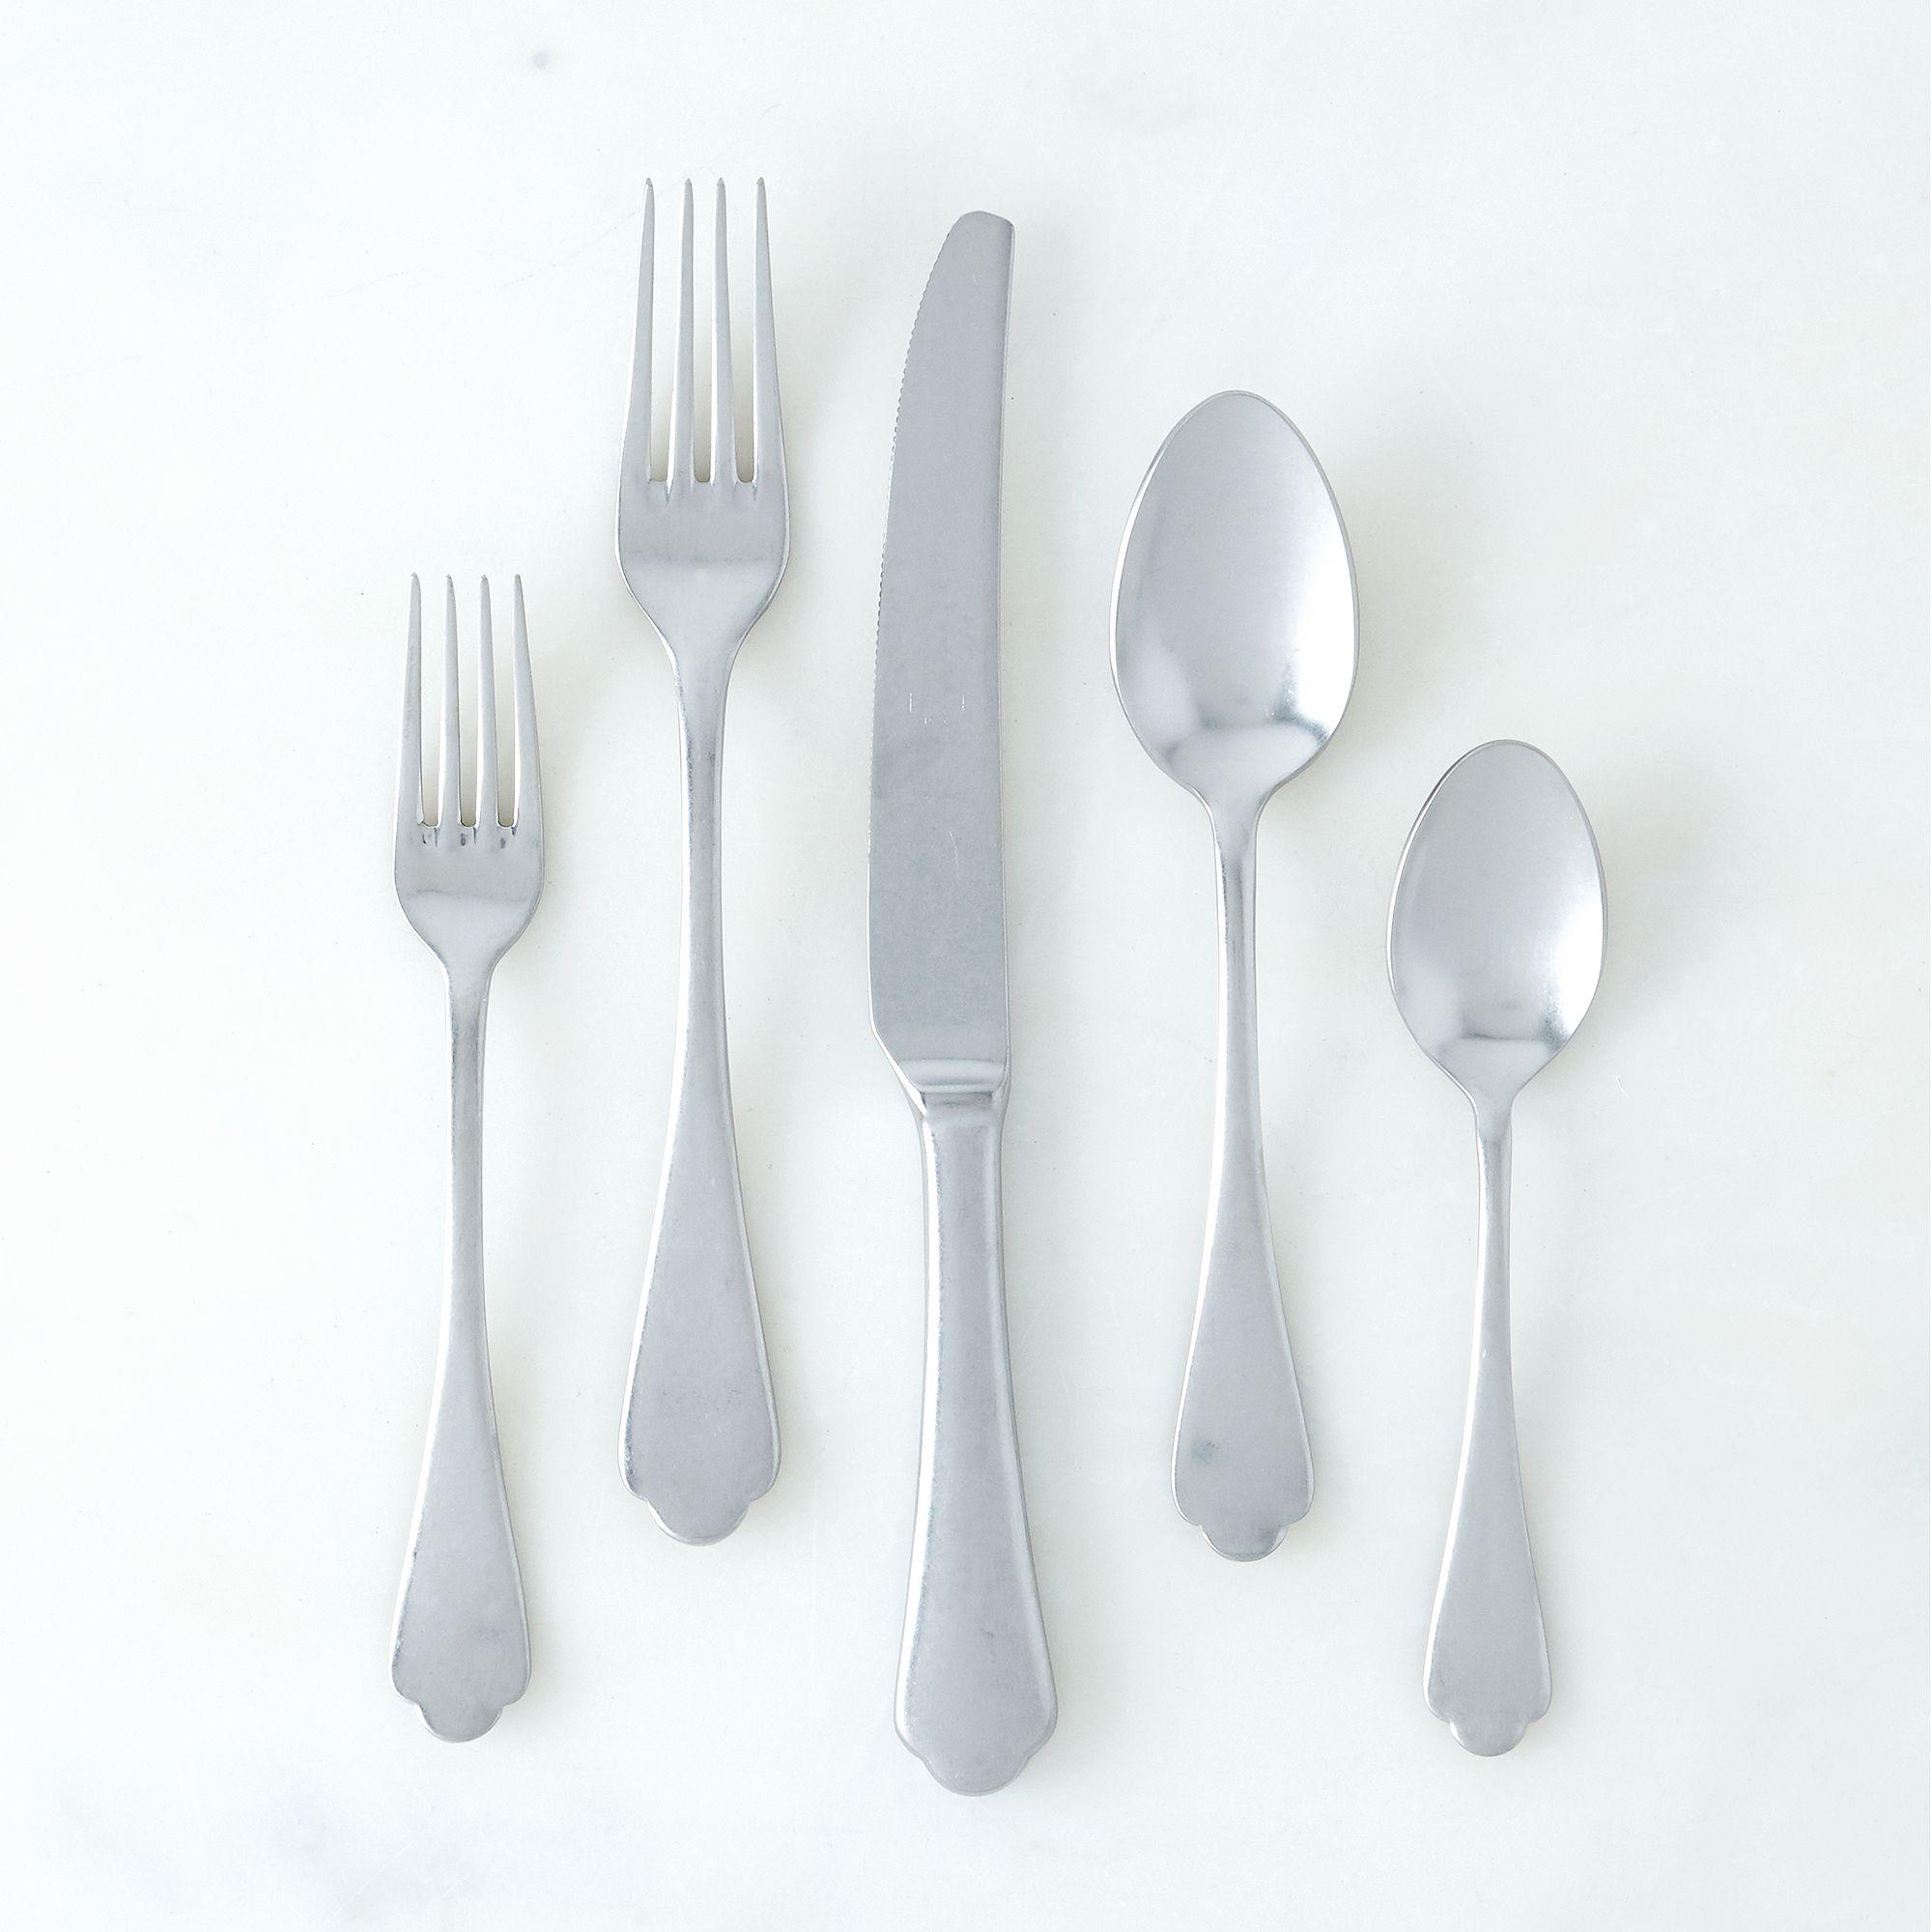 Italian Flatware, Dolce Vita (5 Piece Set) - Flatware -- Dinnerware ...